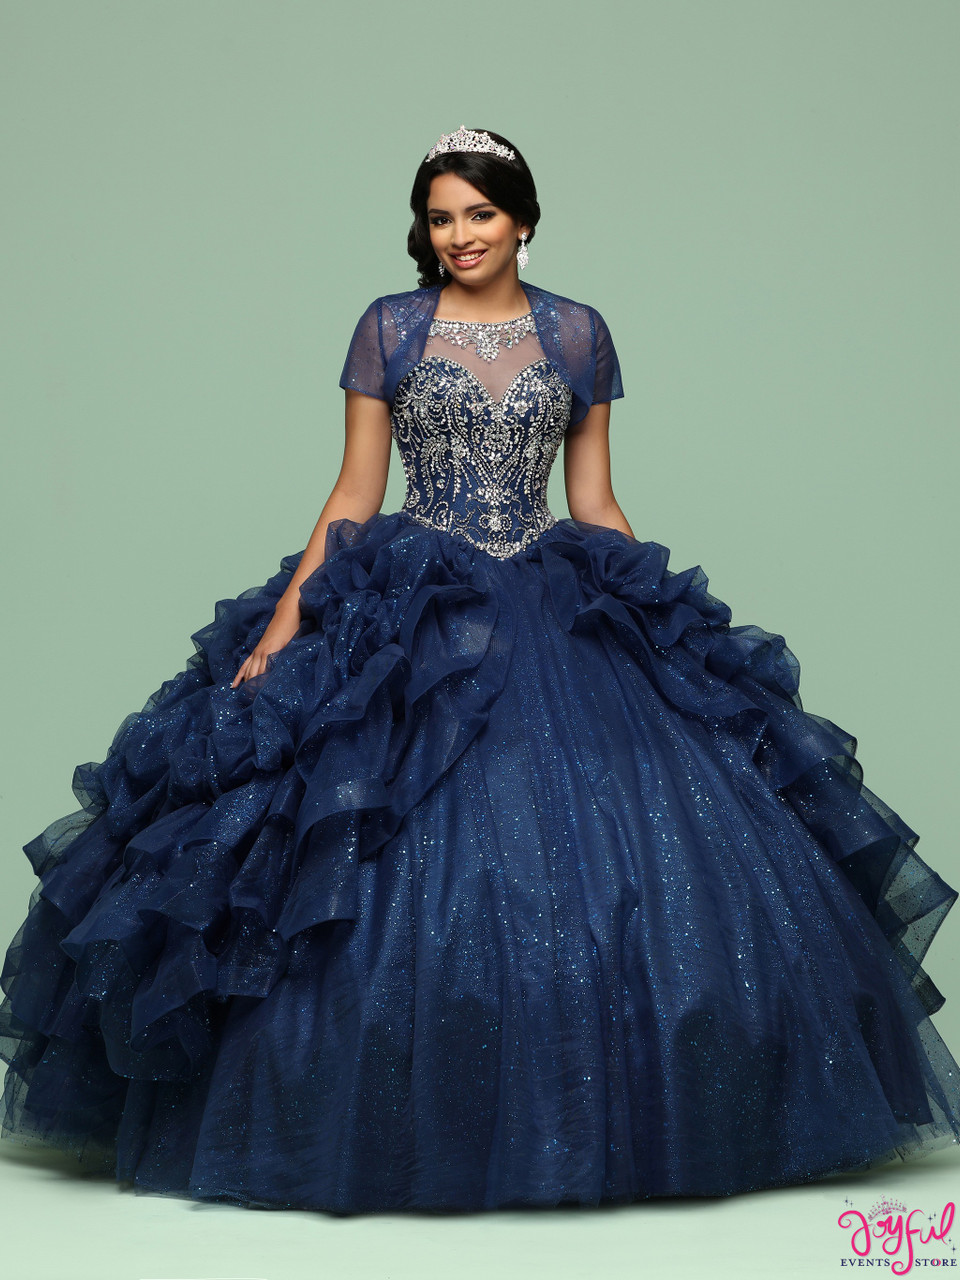 f4d542f2607 Quinceanera Dress  80404 - Joyful Events Store